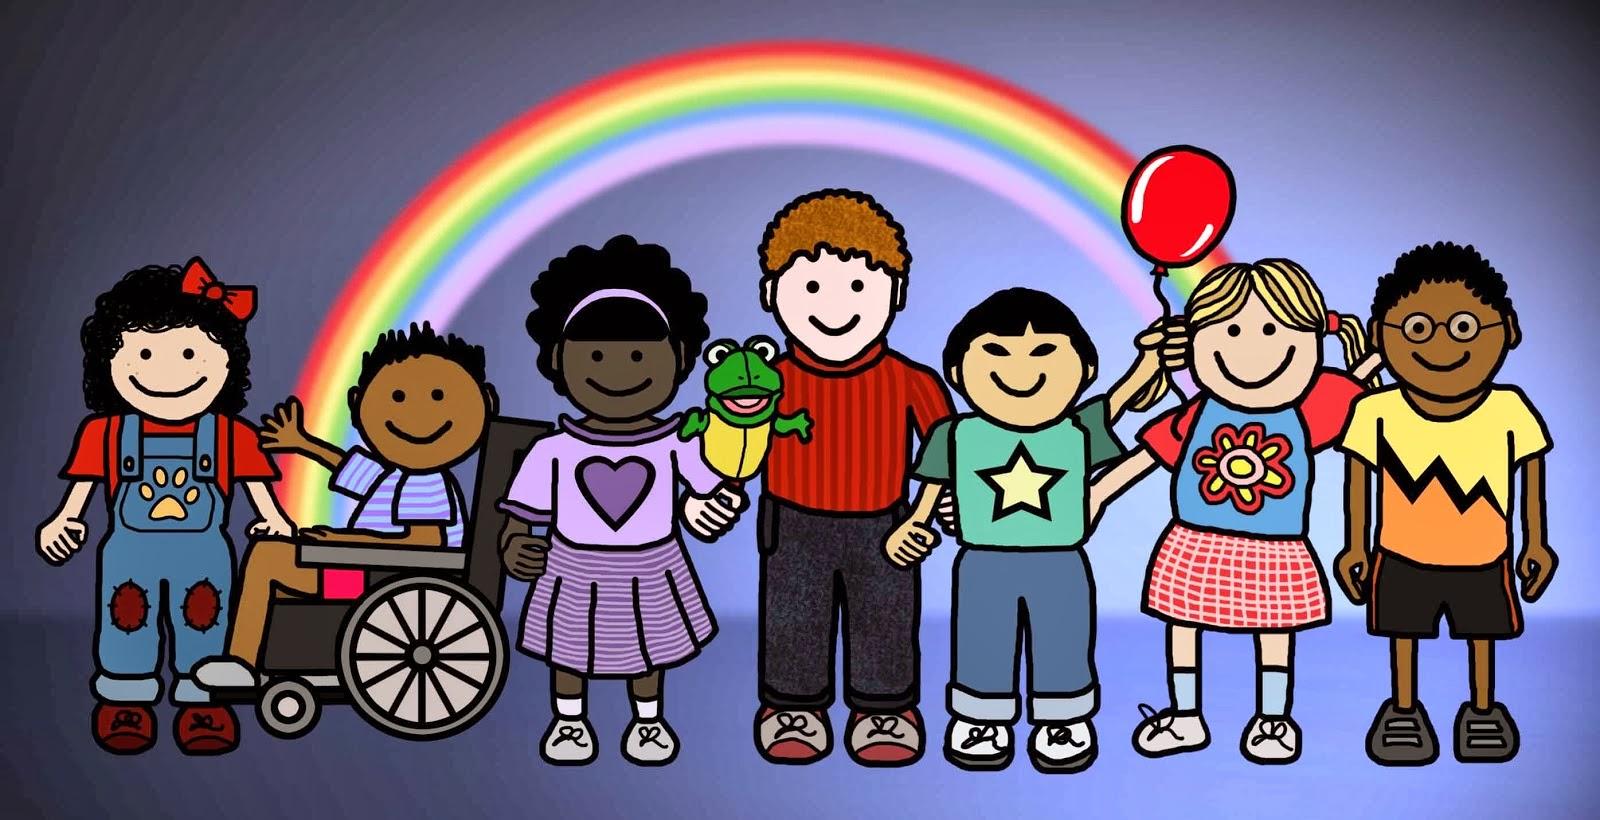 Game Dalam Bimbingan Dan Konseling Prota Promes Rpl Rpbk Bimbingan Konseling Untuk Smp Sekolah Dasar Luar Biasa Putra Jaya Malang Satukan Niat Dan Tekat